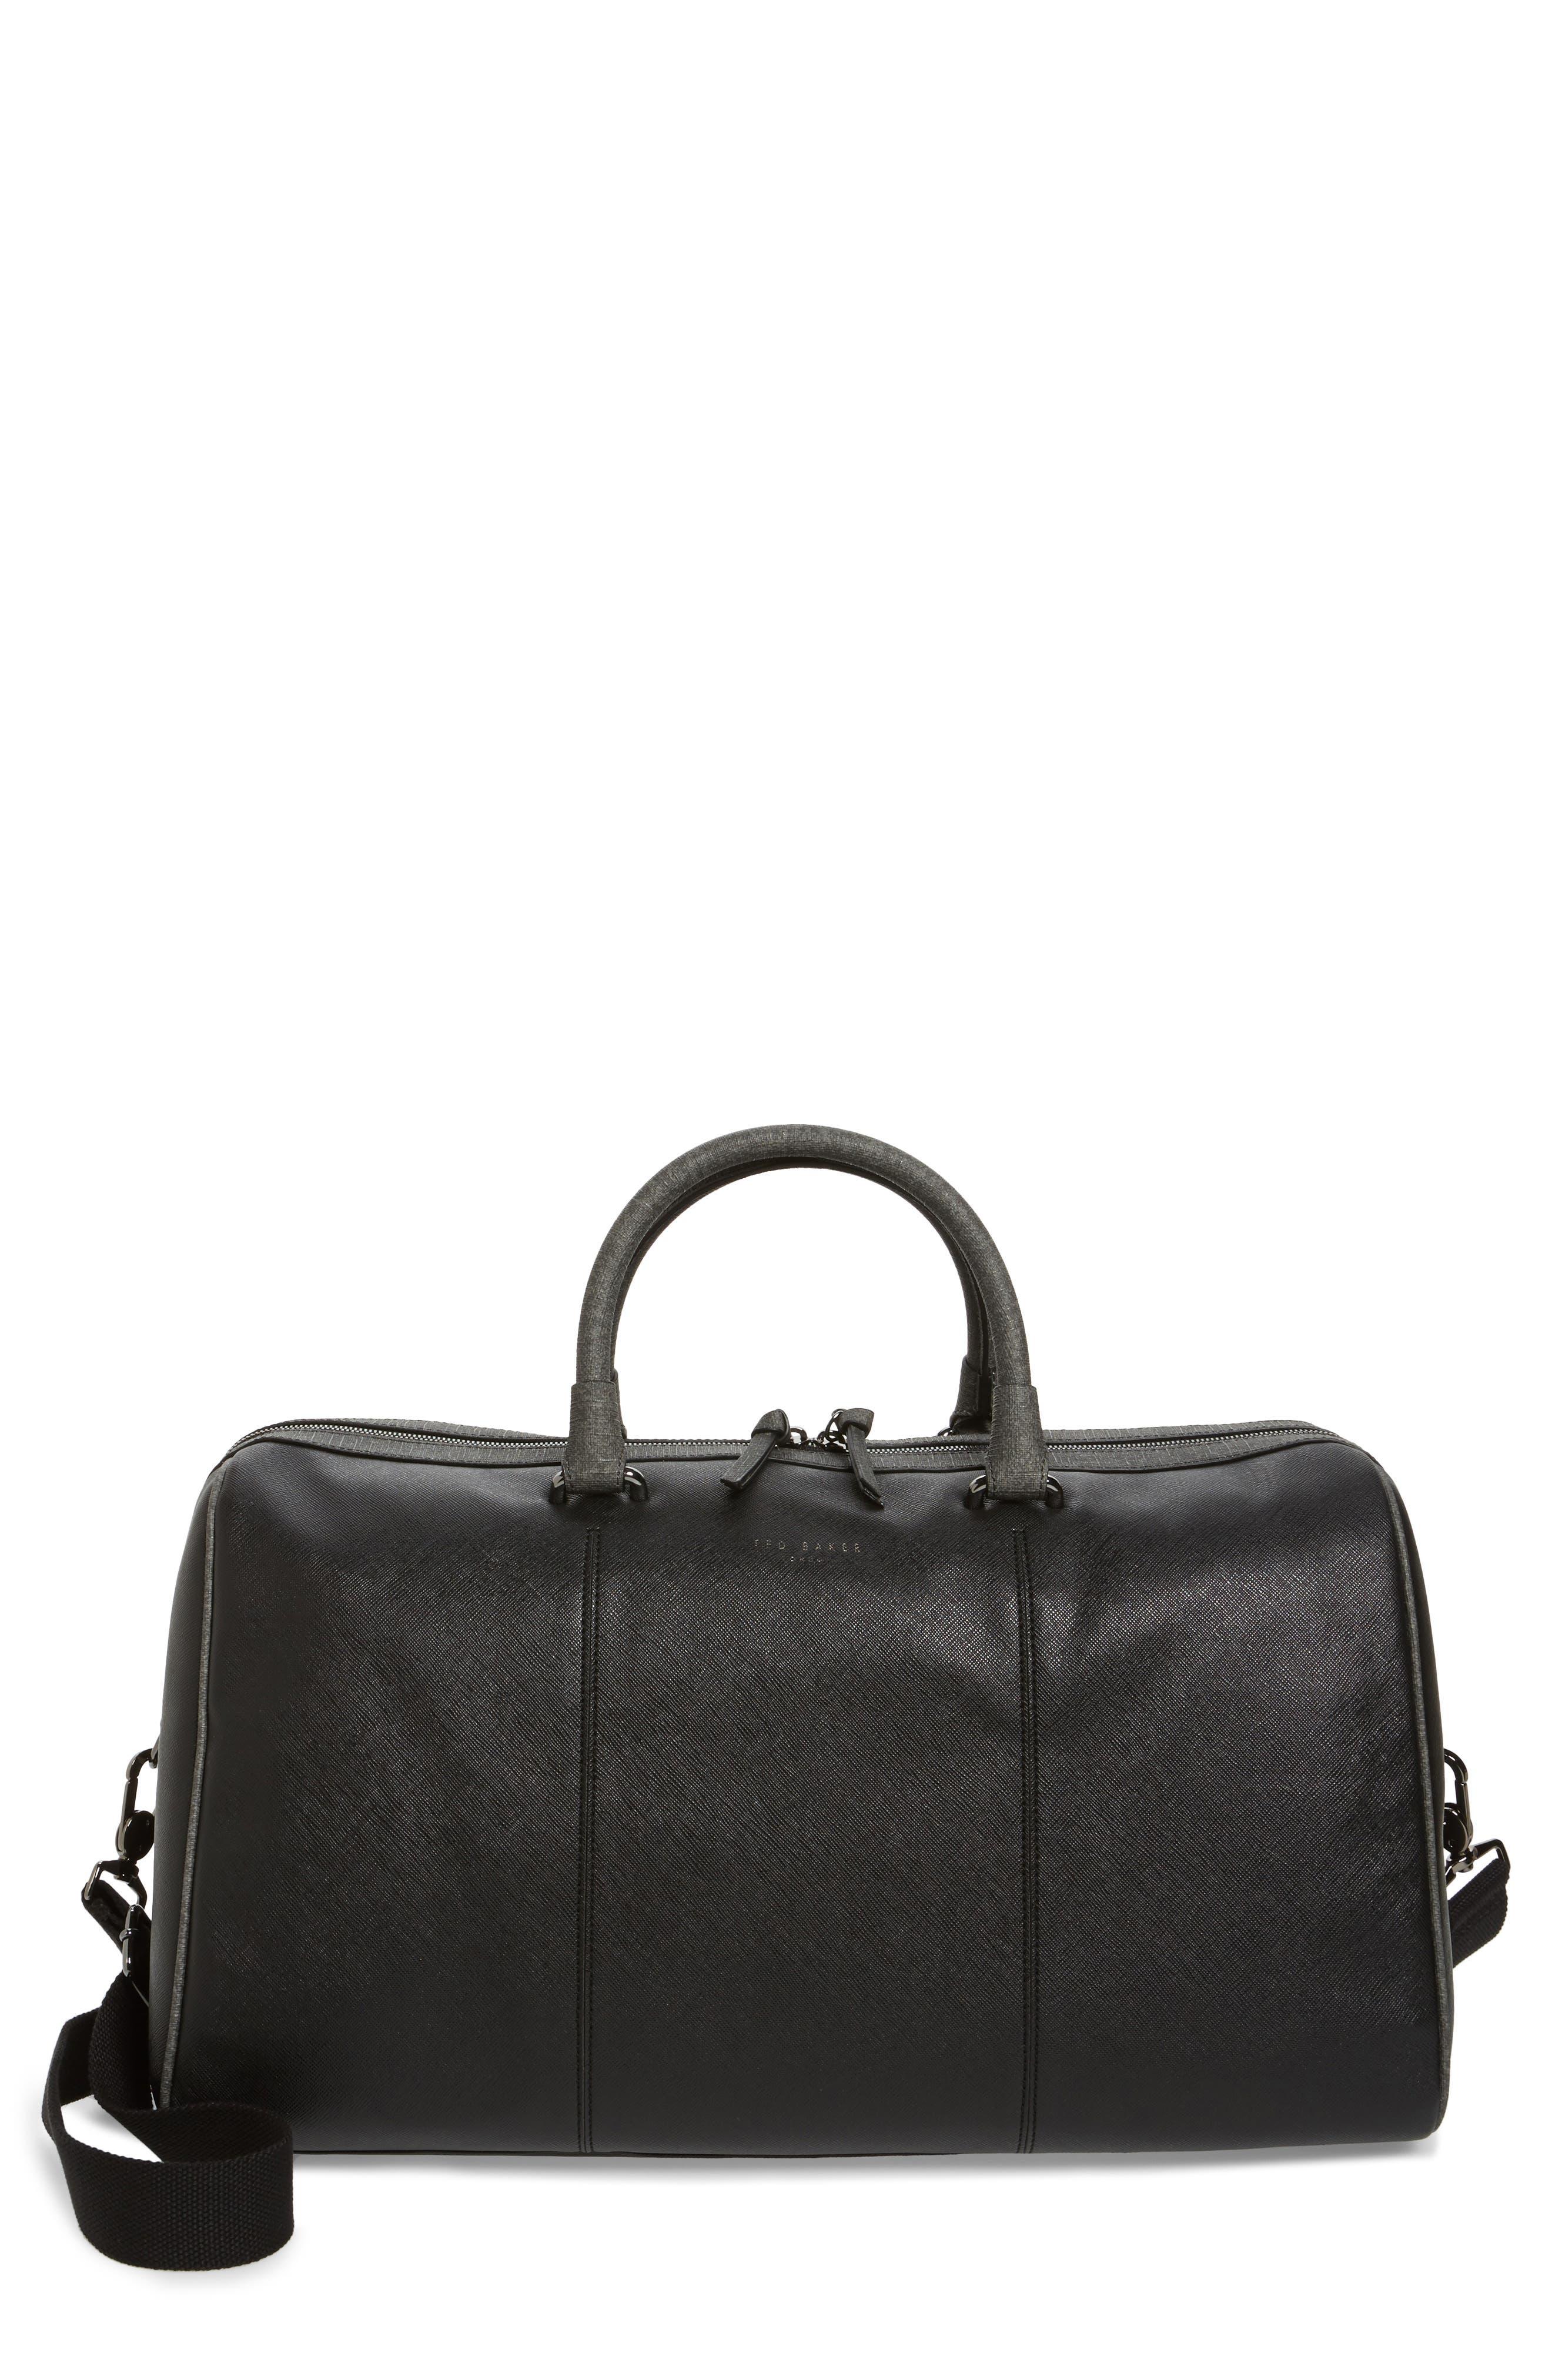 Claws Duffel Bag, Main, color, 001